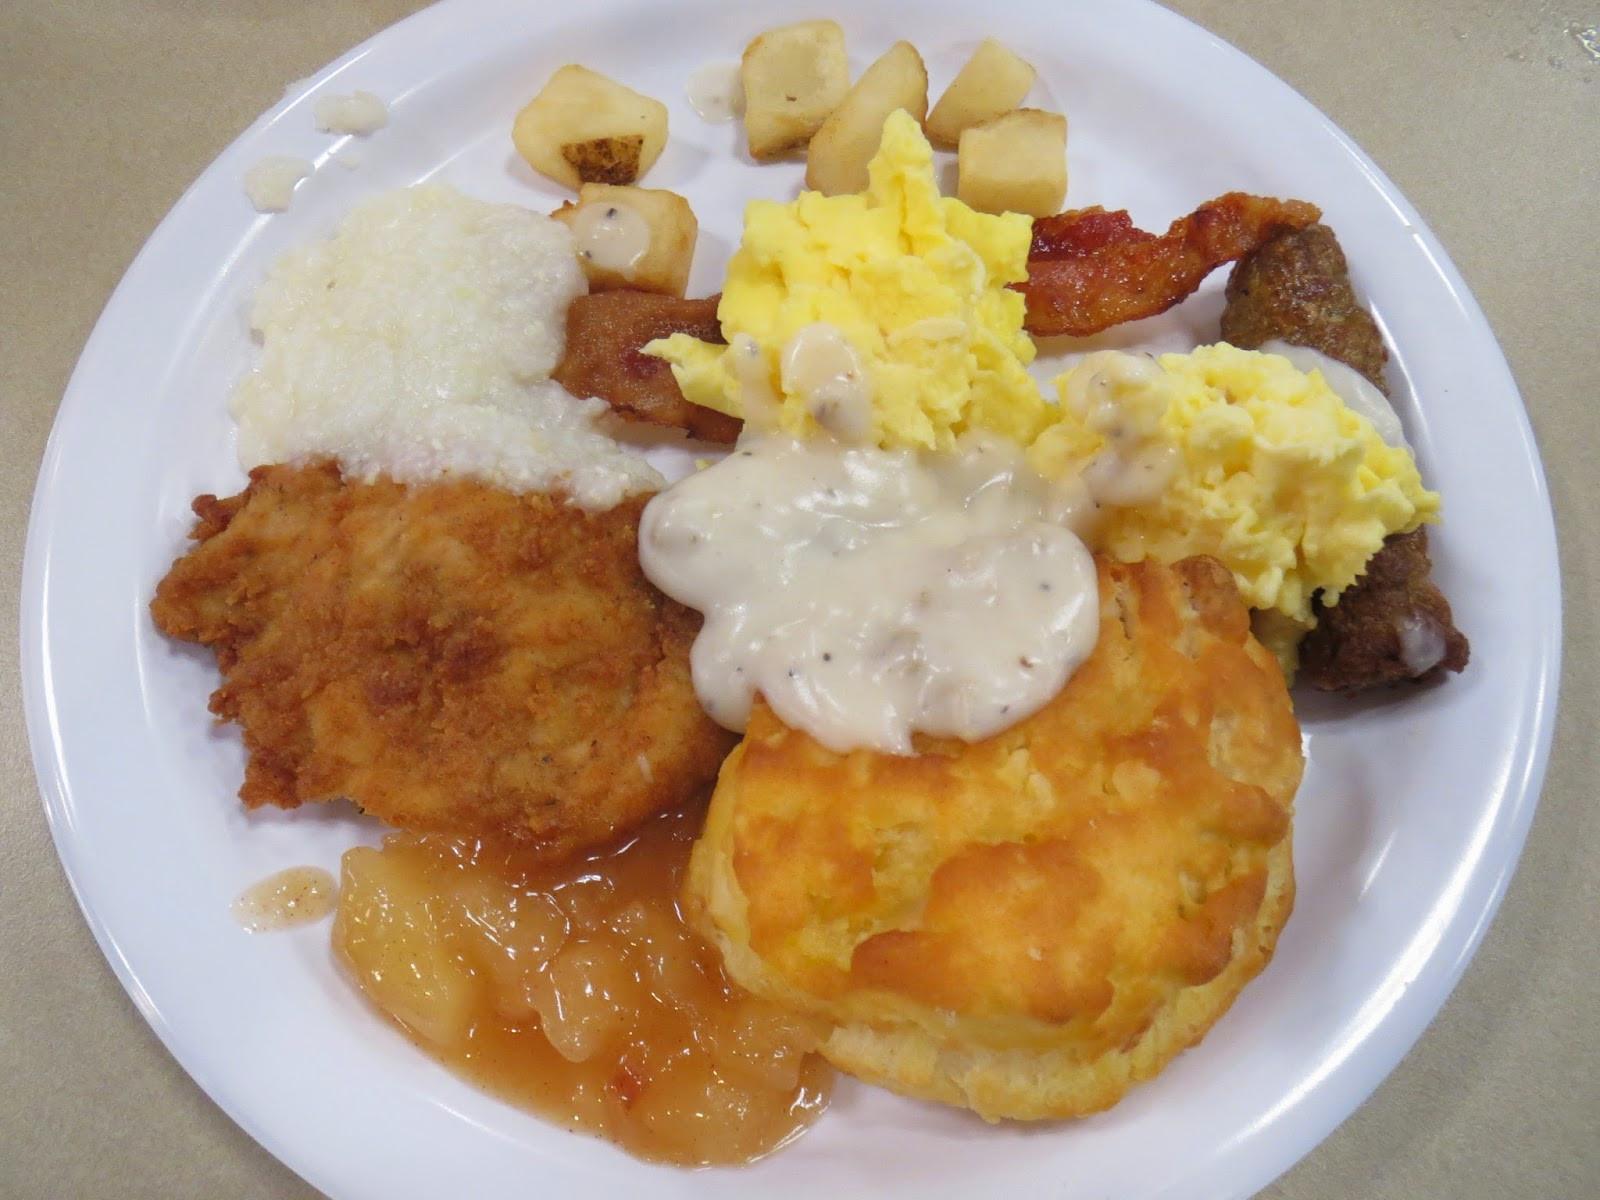 Chick Fil A Healthy Breakfast  A Chick Fil A Breakfast Buffet THE INTERNET IS IN AMERICA